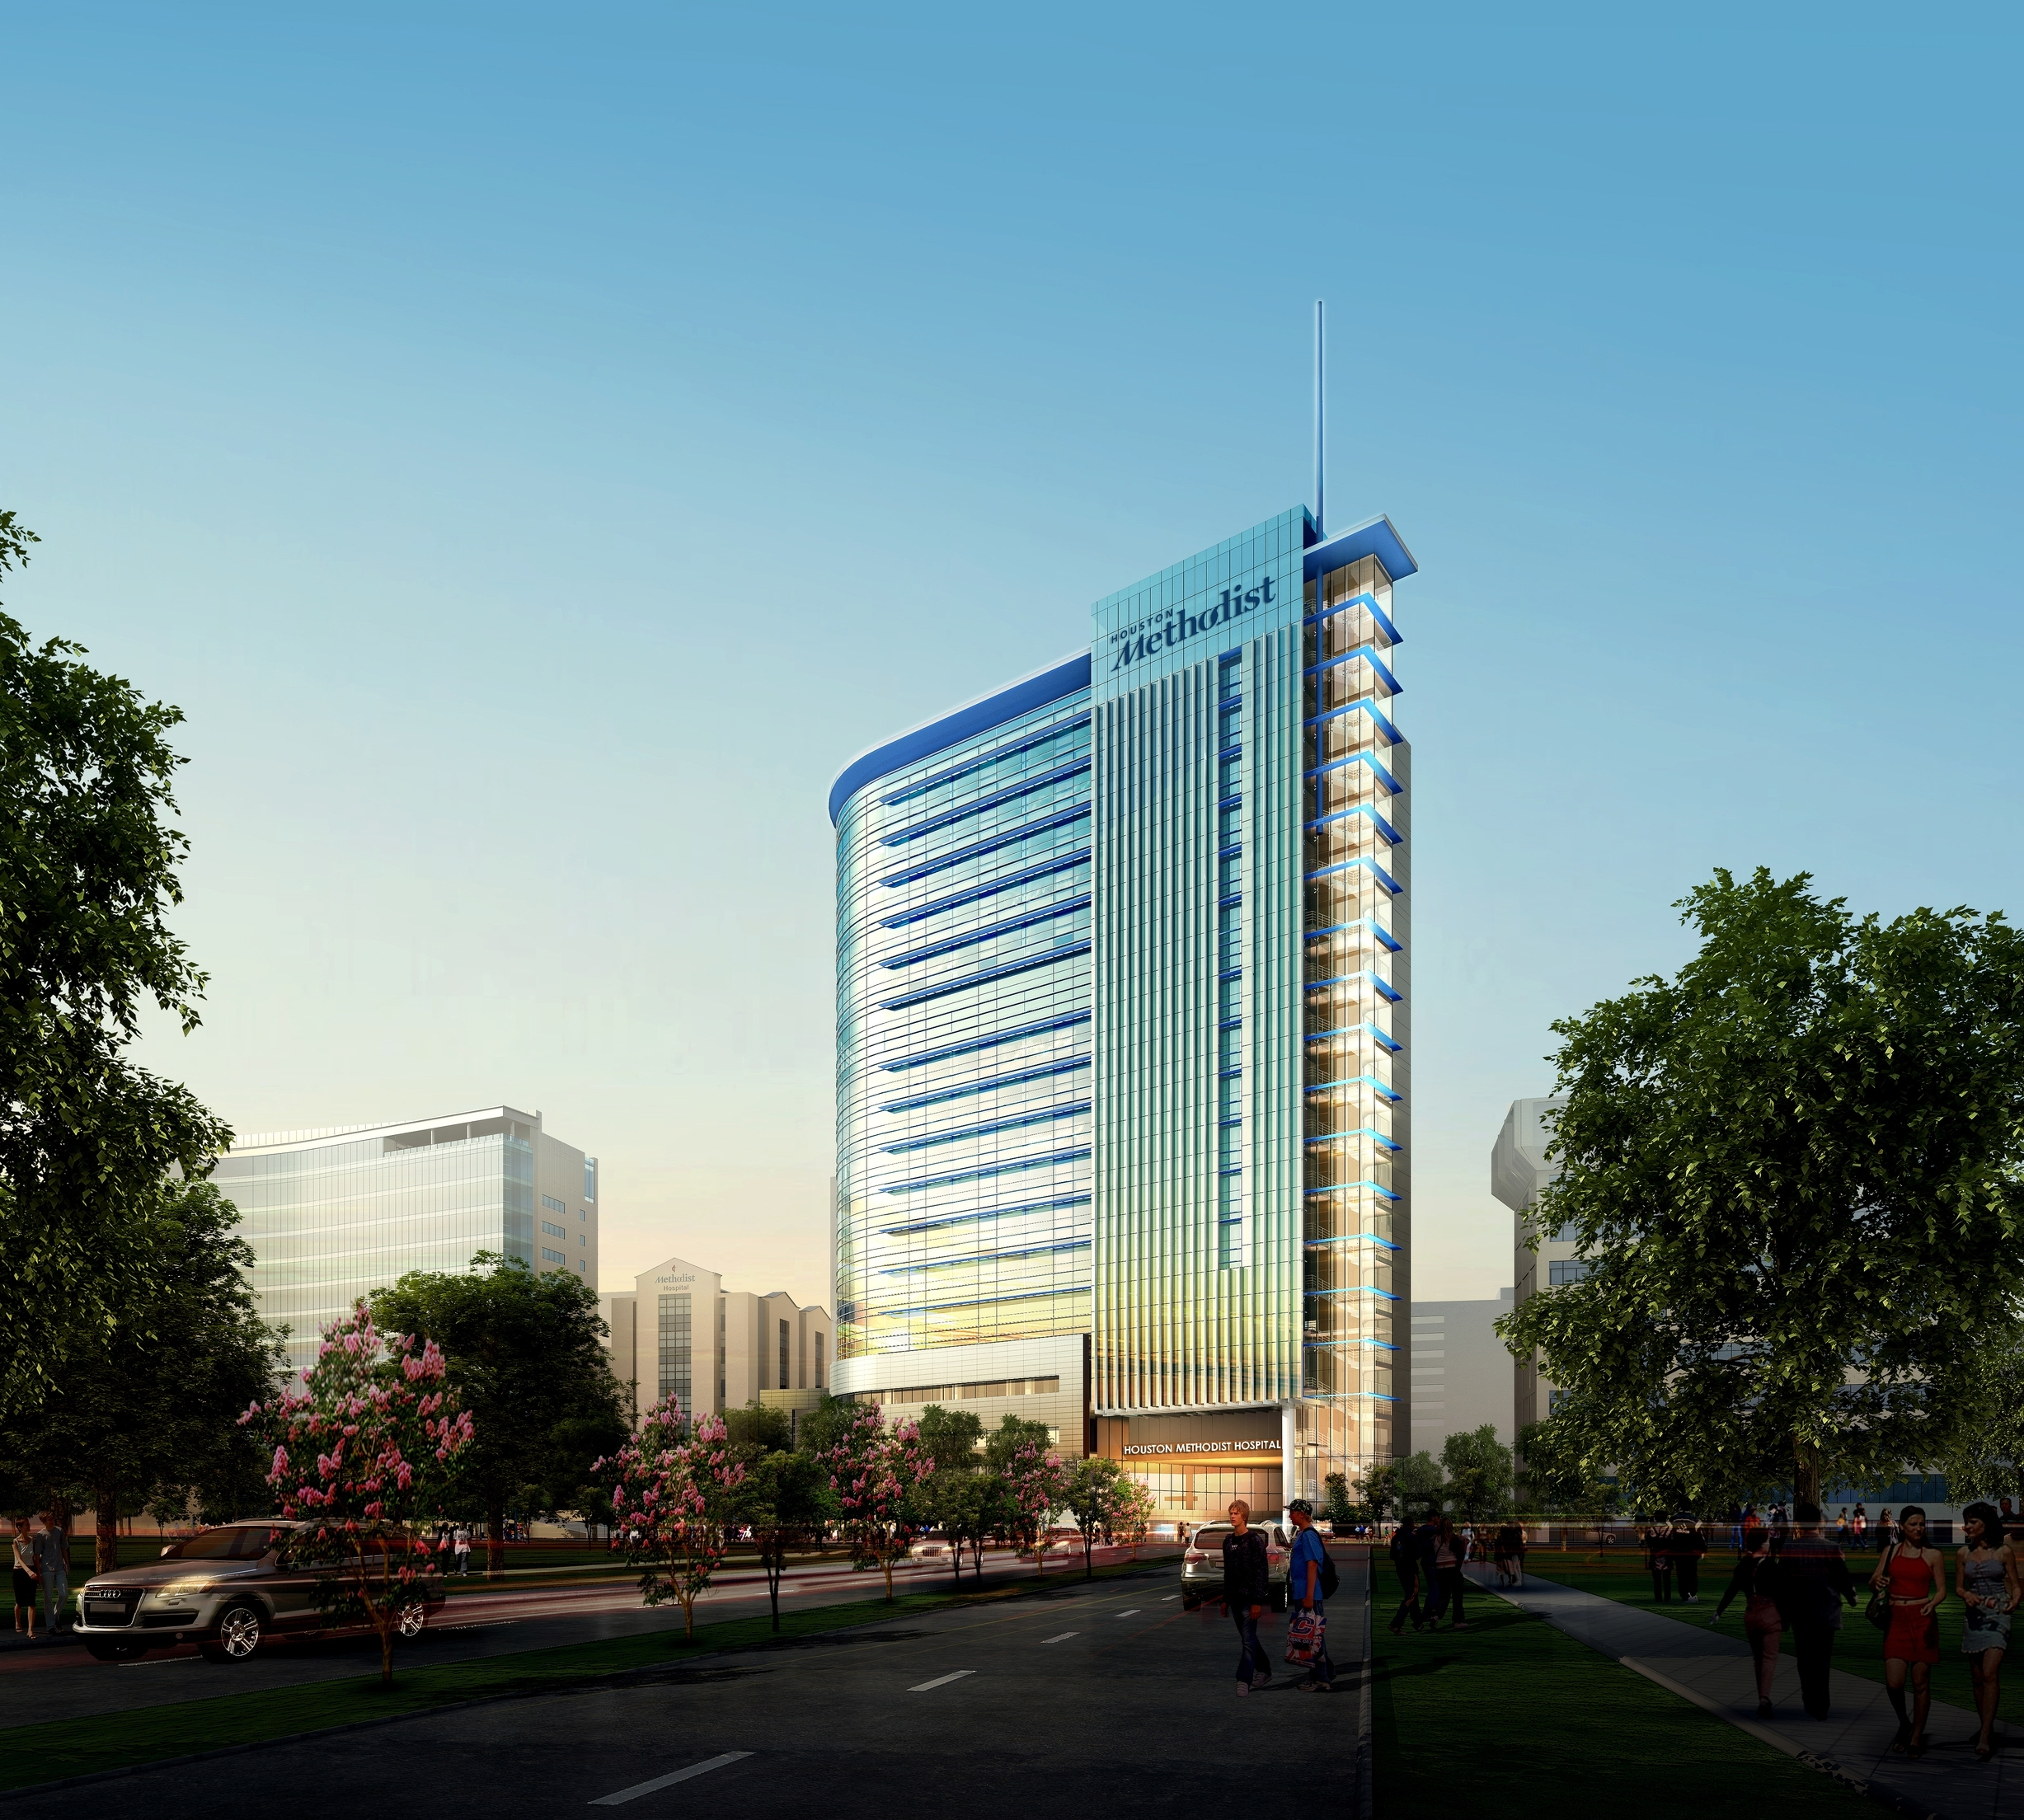 Houston Methodist Hospital North Campus Expansion Network Services